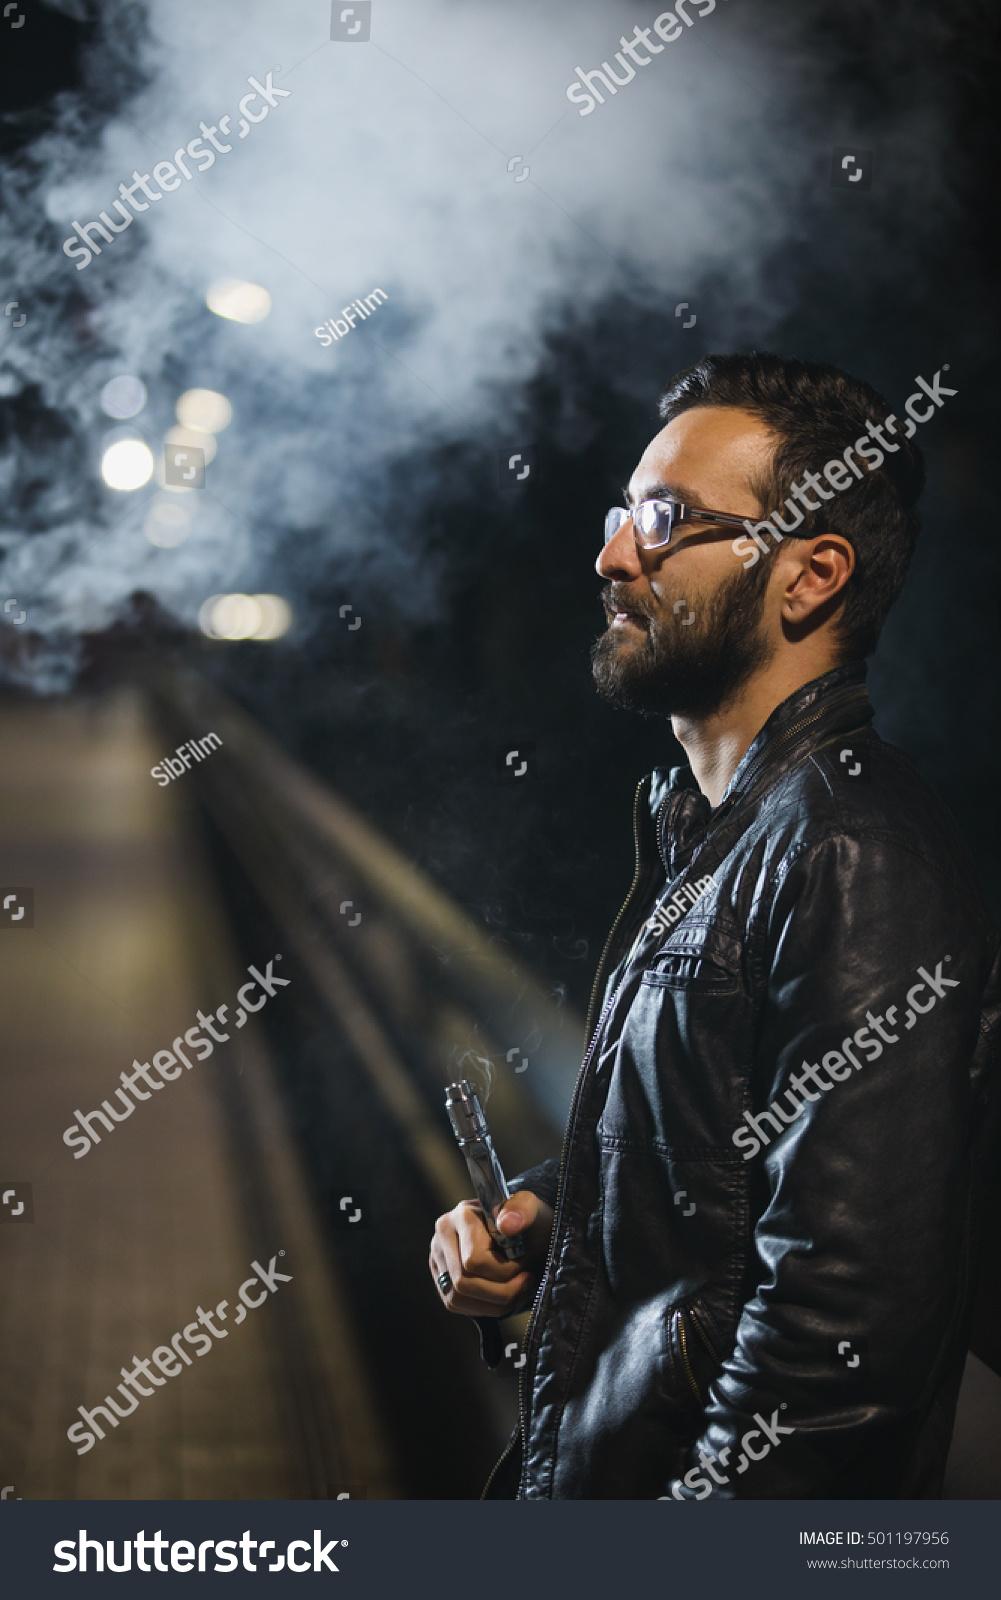 Charlie milf posing outdoors Hot